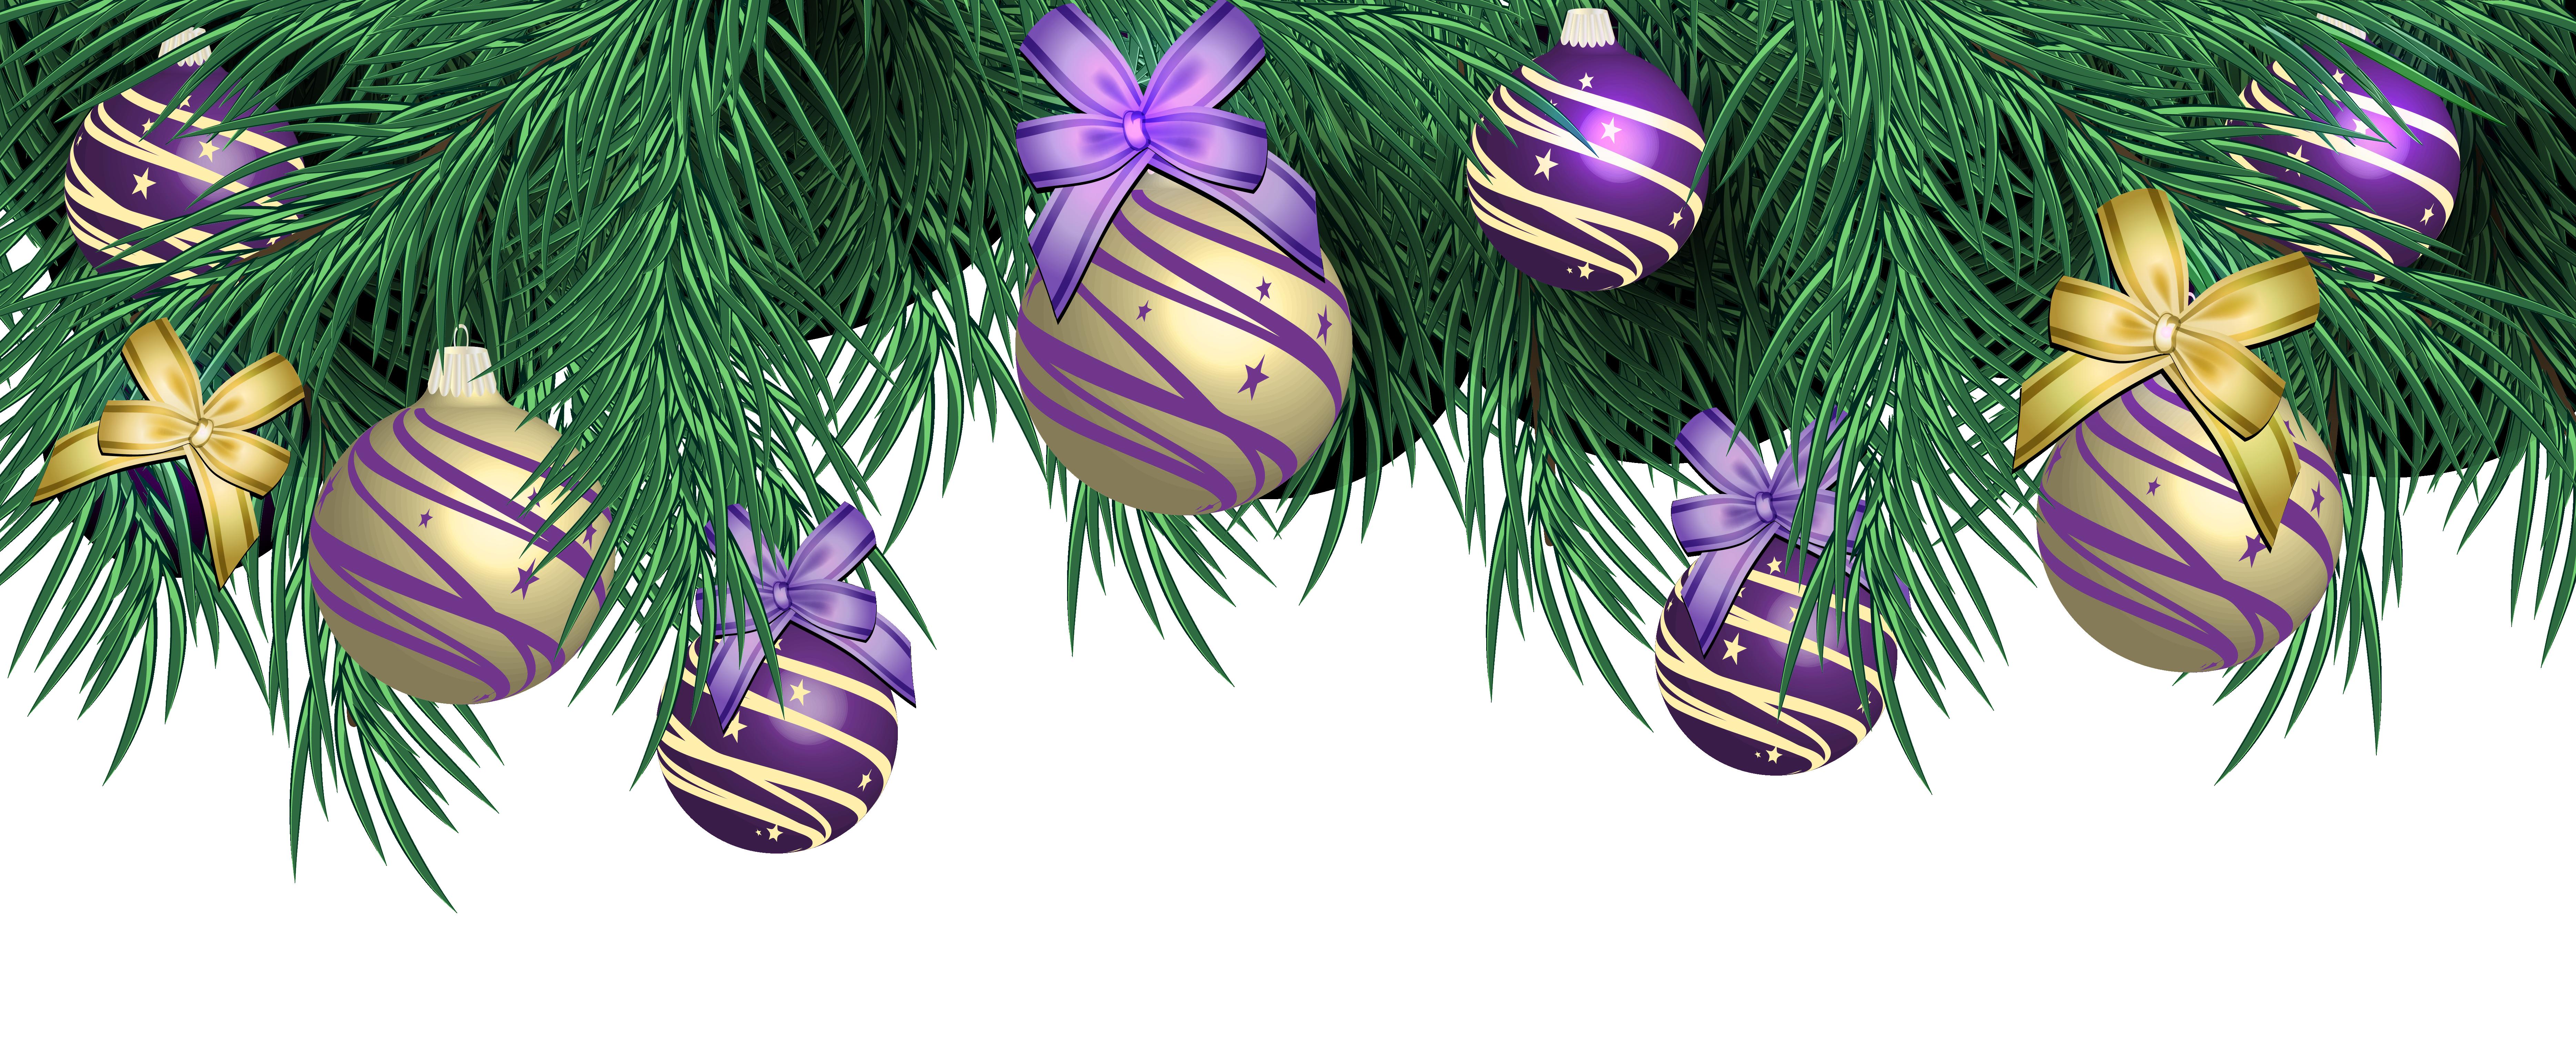 Blue and purple christmas contemporary tree clipart banner library Free Purple Christmas Cliparts, Download Free Clip Art, Free Clip ... banner library